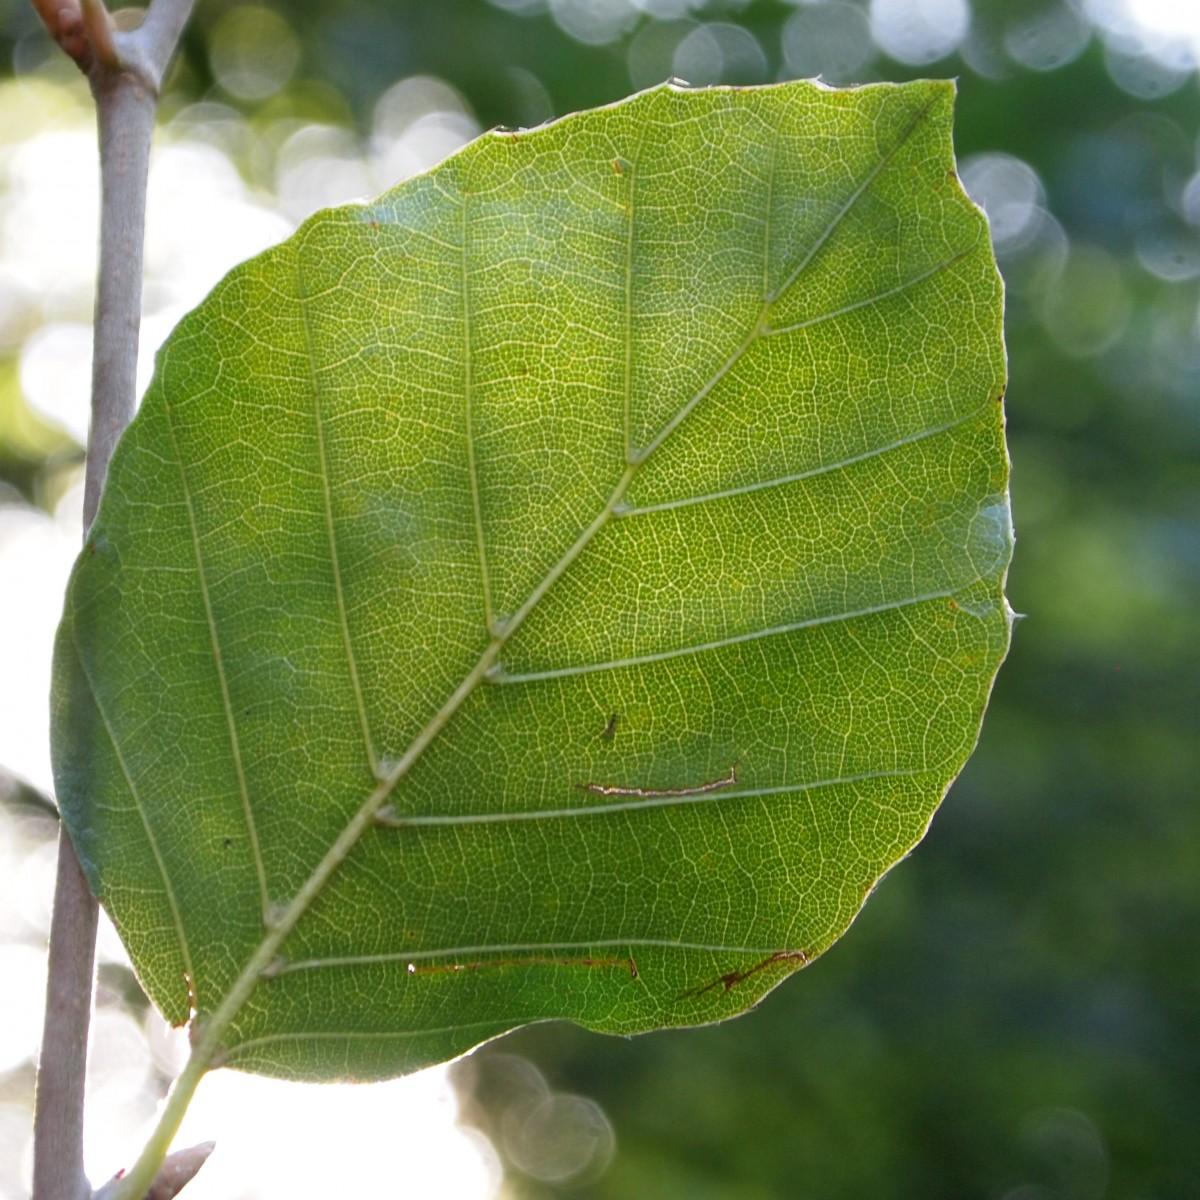 Fotos gratis rbol bosque rama fruta hoja flor for Arboles de hoja perenne wikipedia